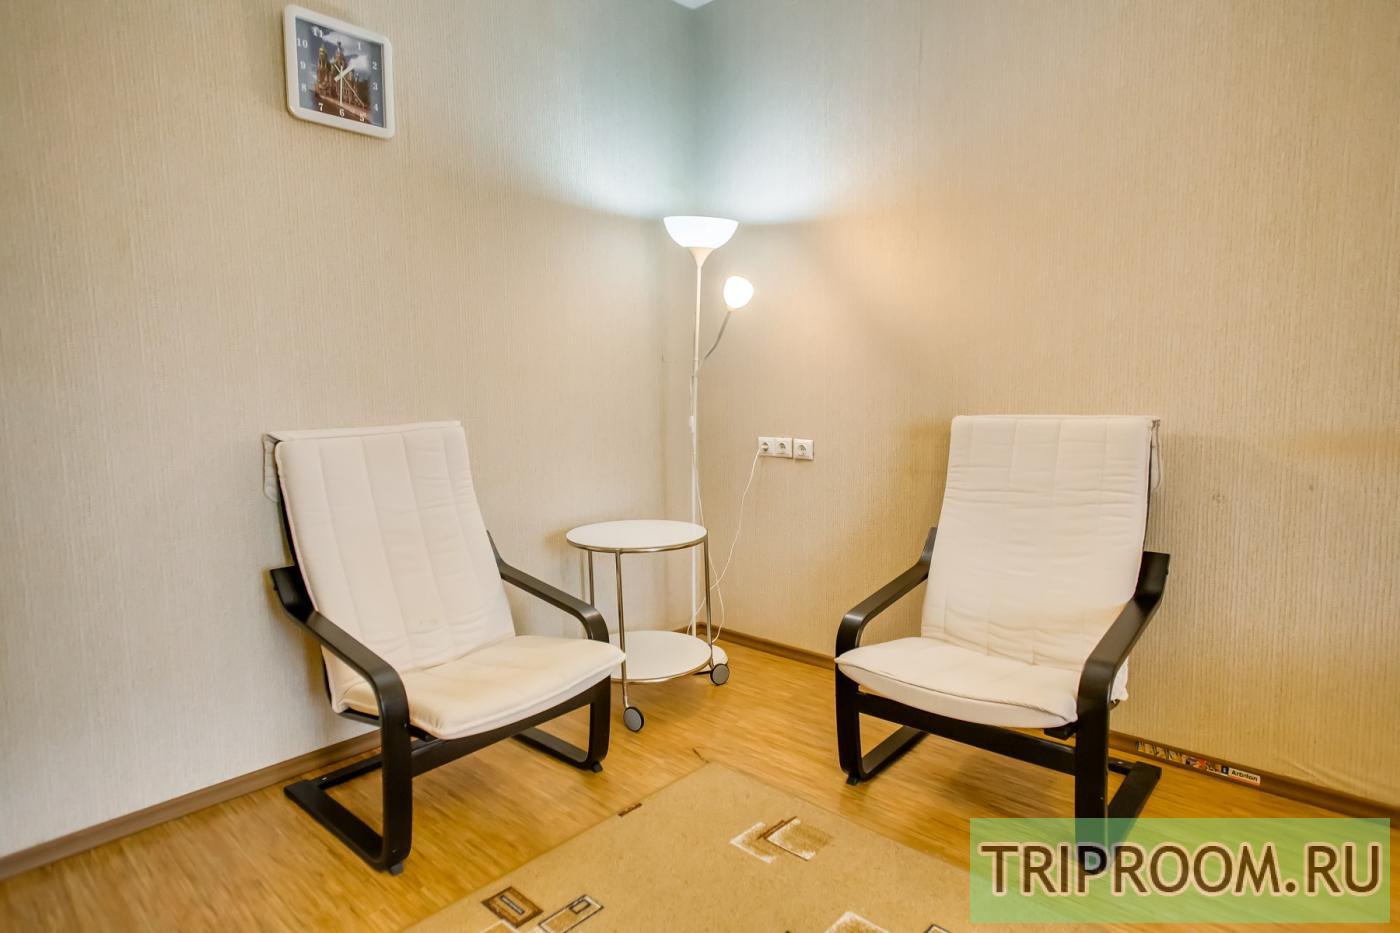 2-комнатная квартира посуточно (вариант № 23730), ул. Максима Горького улица, фото № 14